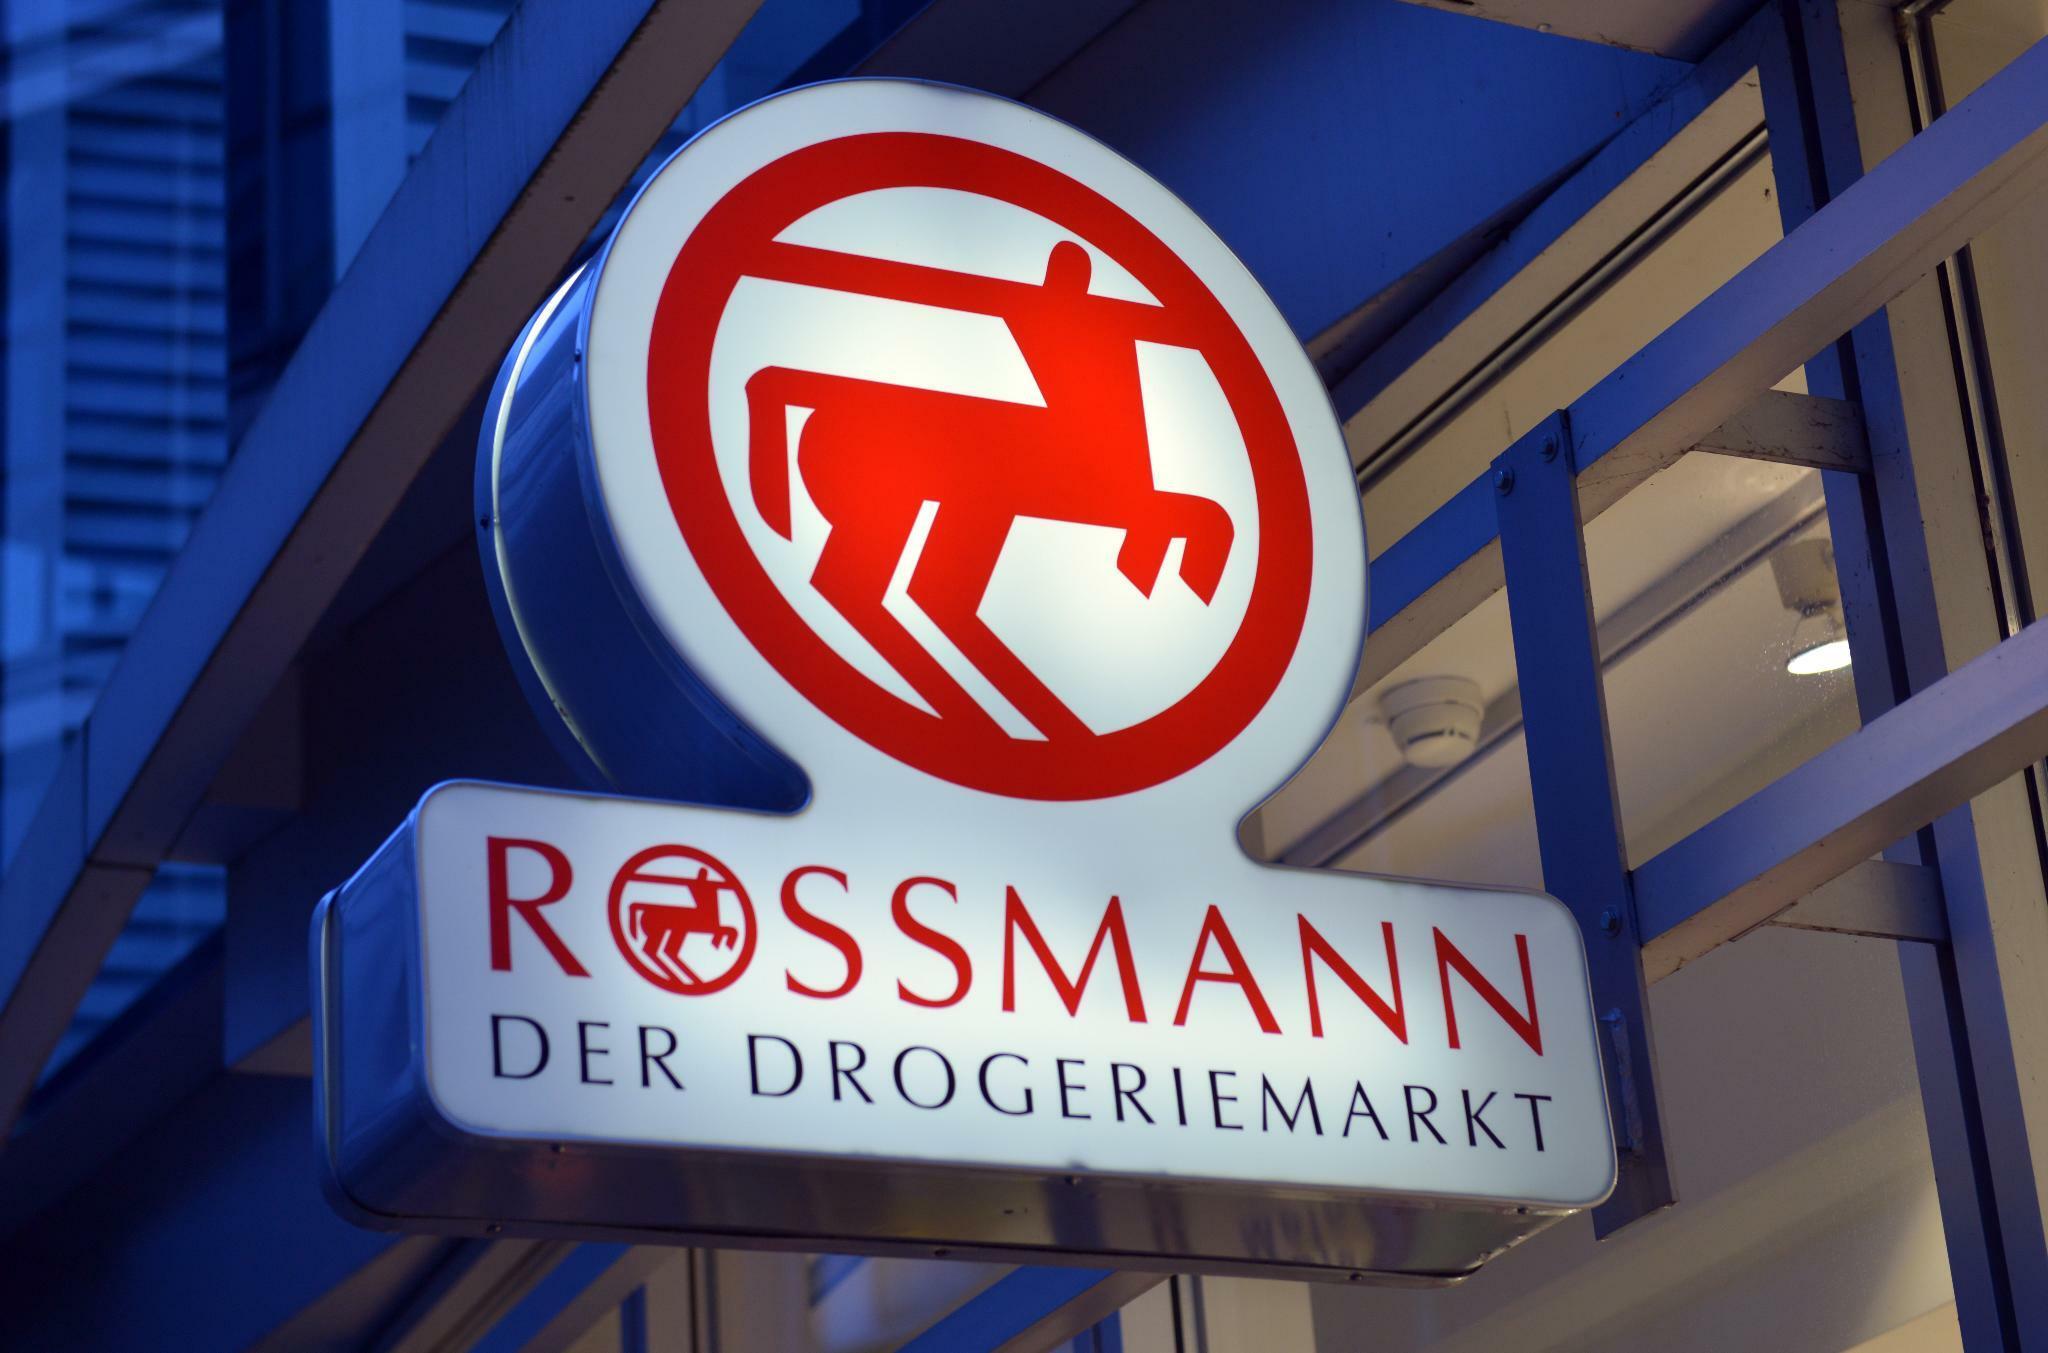 drogeriekette rossmann plant 230 neue filialen vor allem im ausland - Rossmann Bewerbung Online